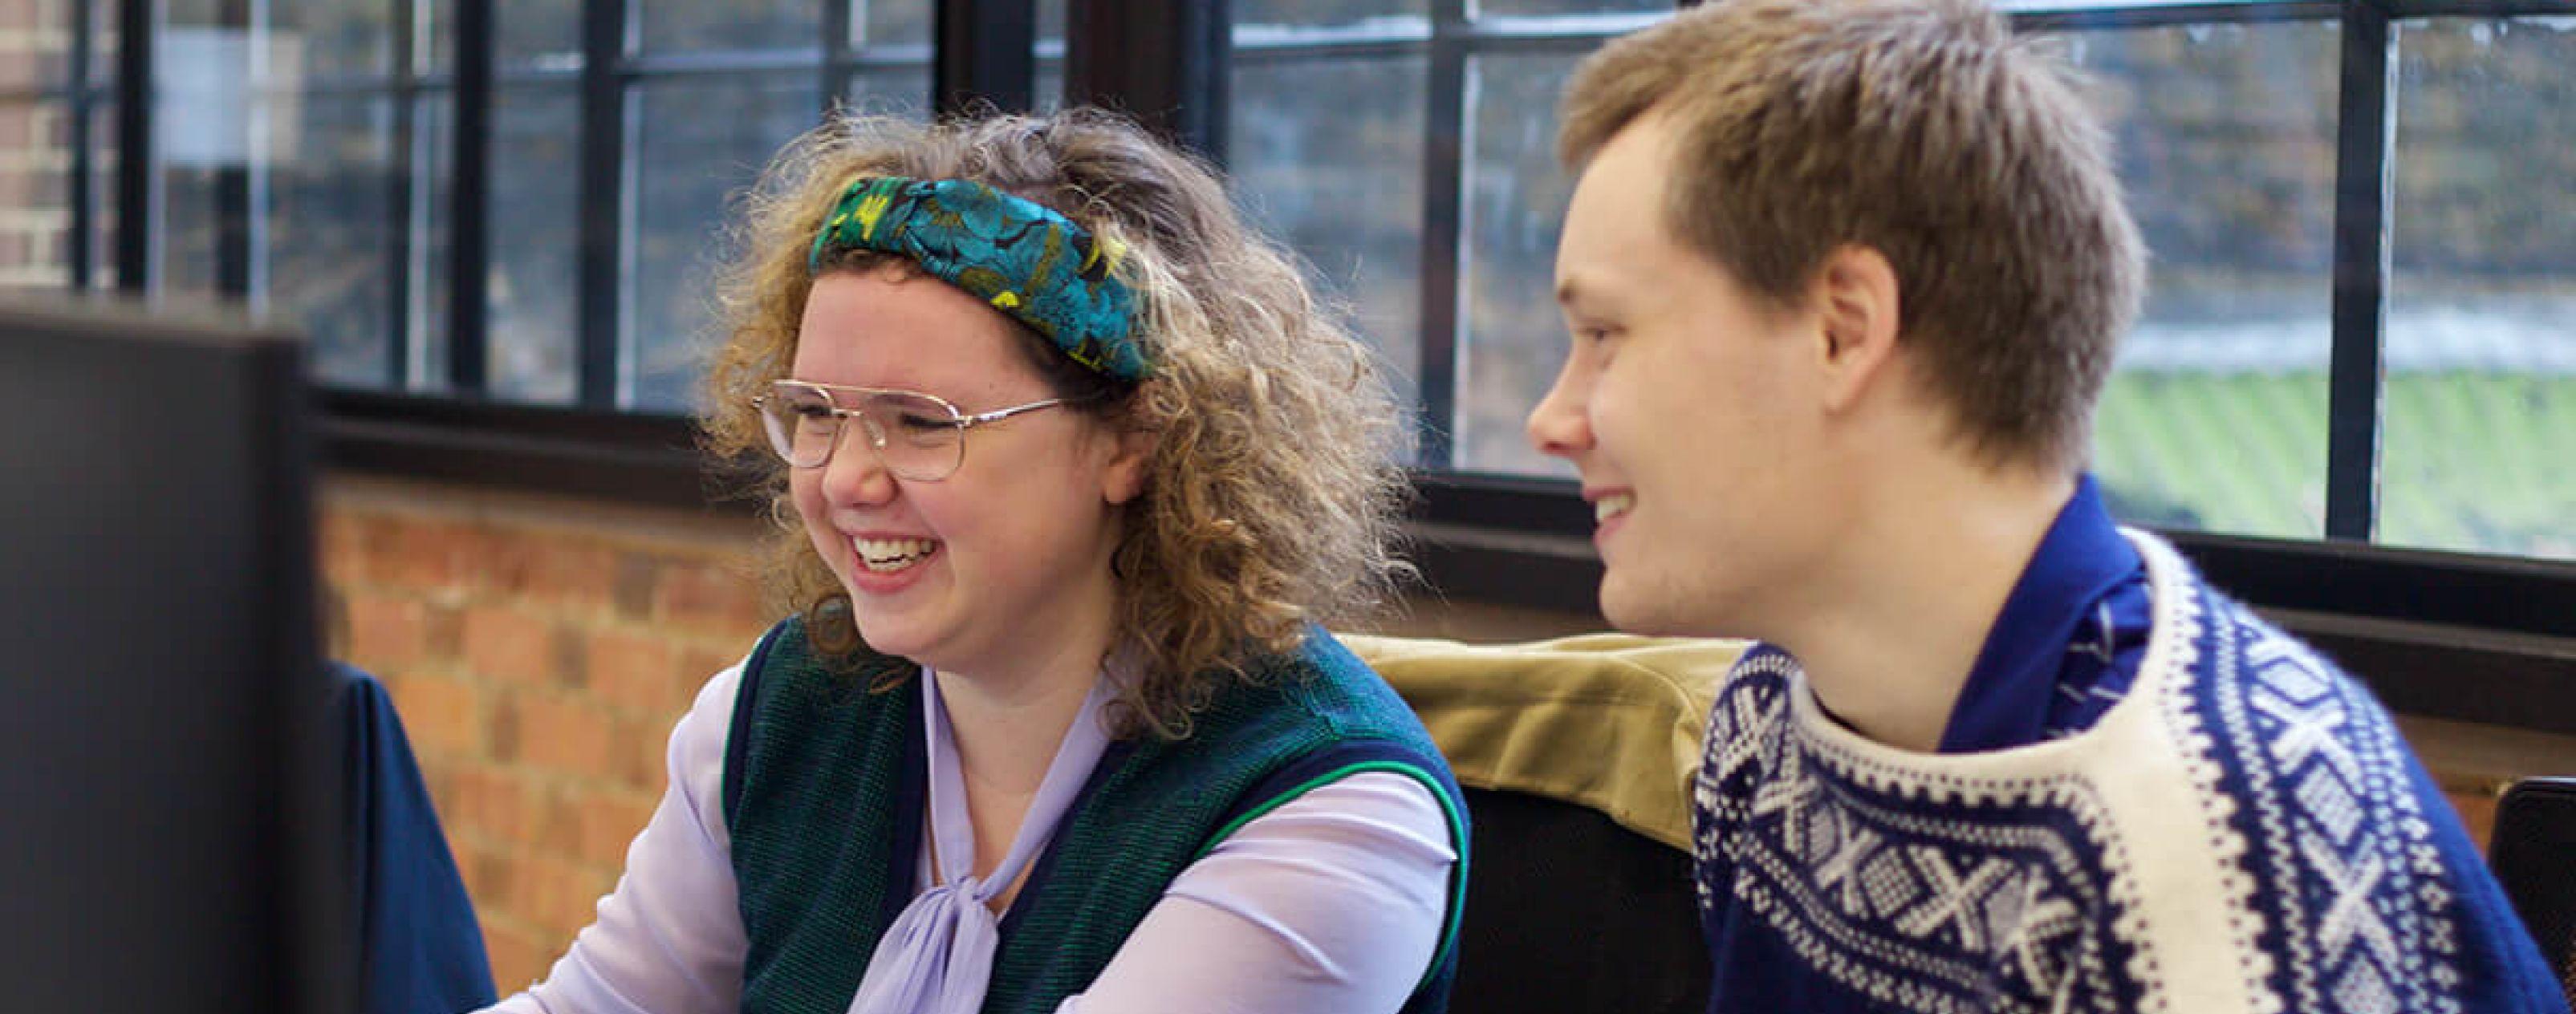 Henrik and Eloise